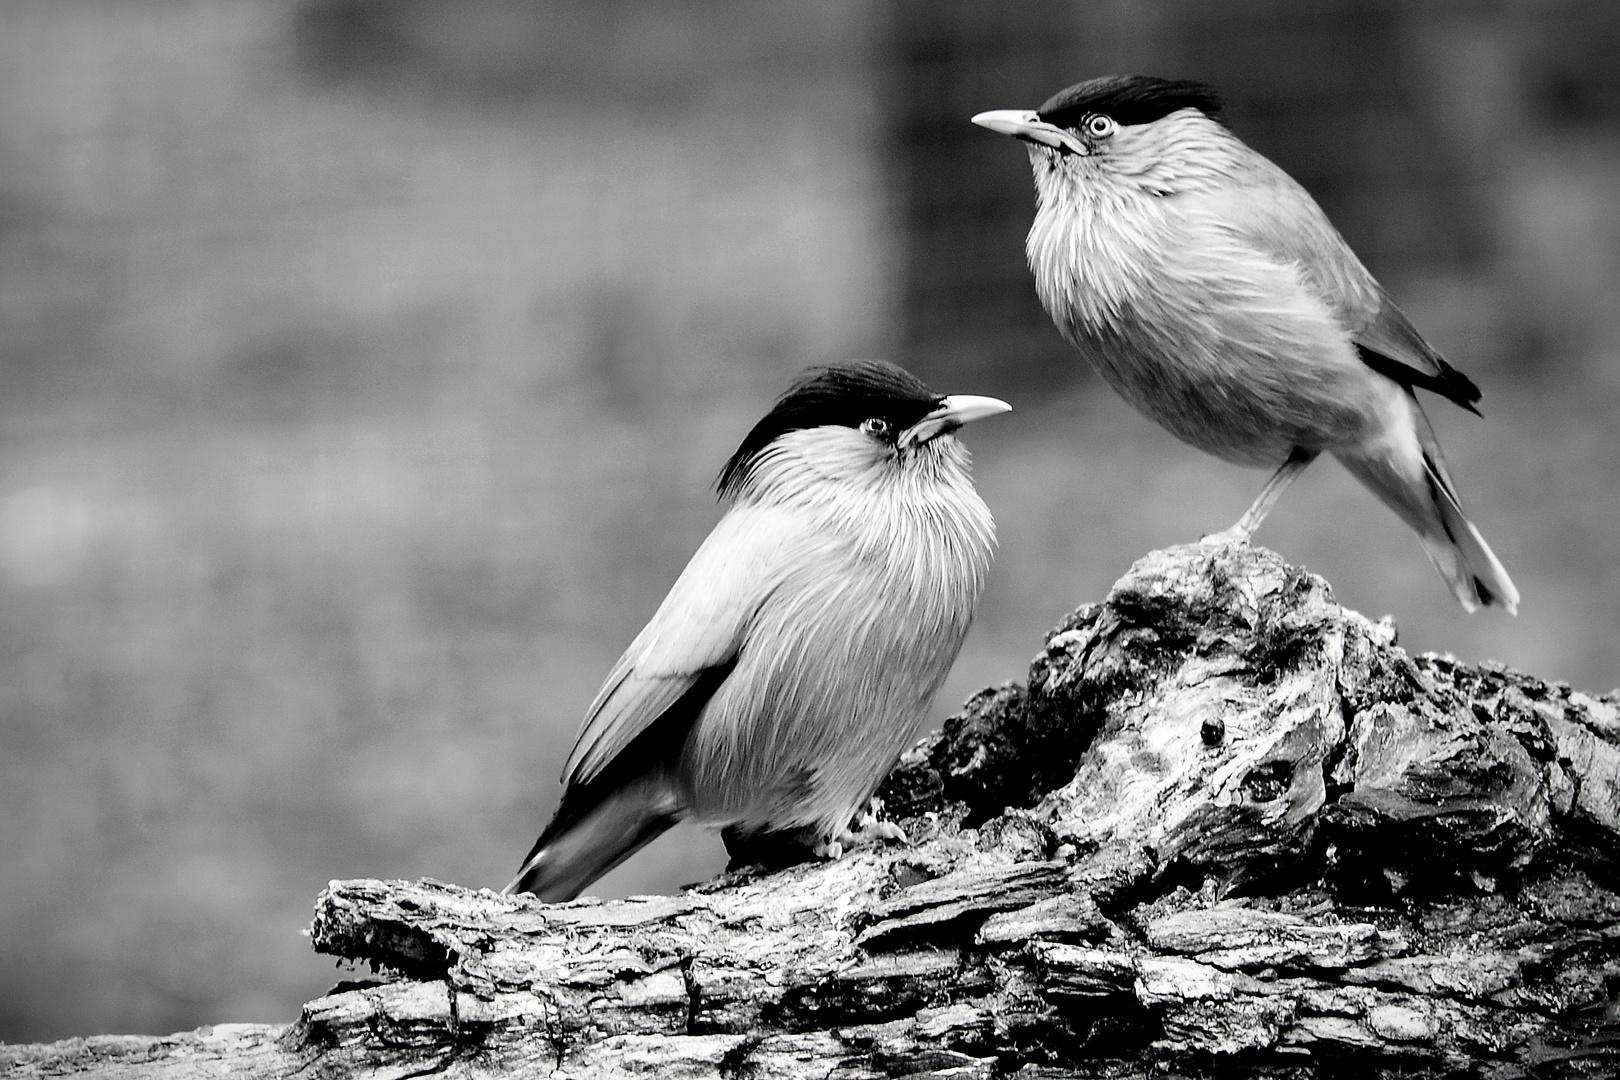 * * * TWO ODD BIRDS * * *